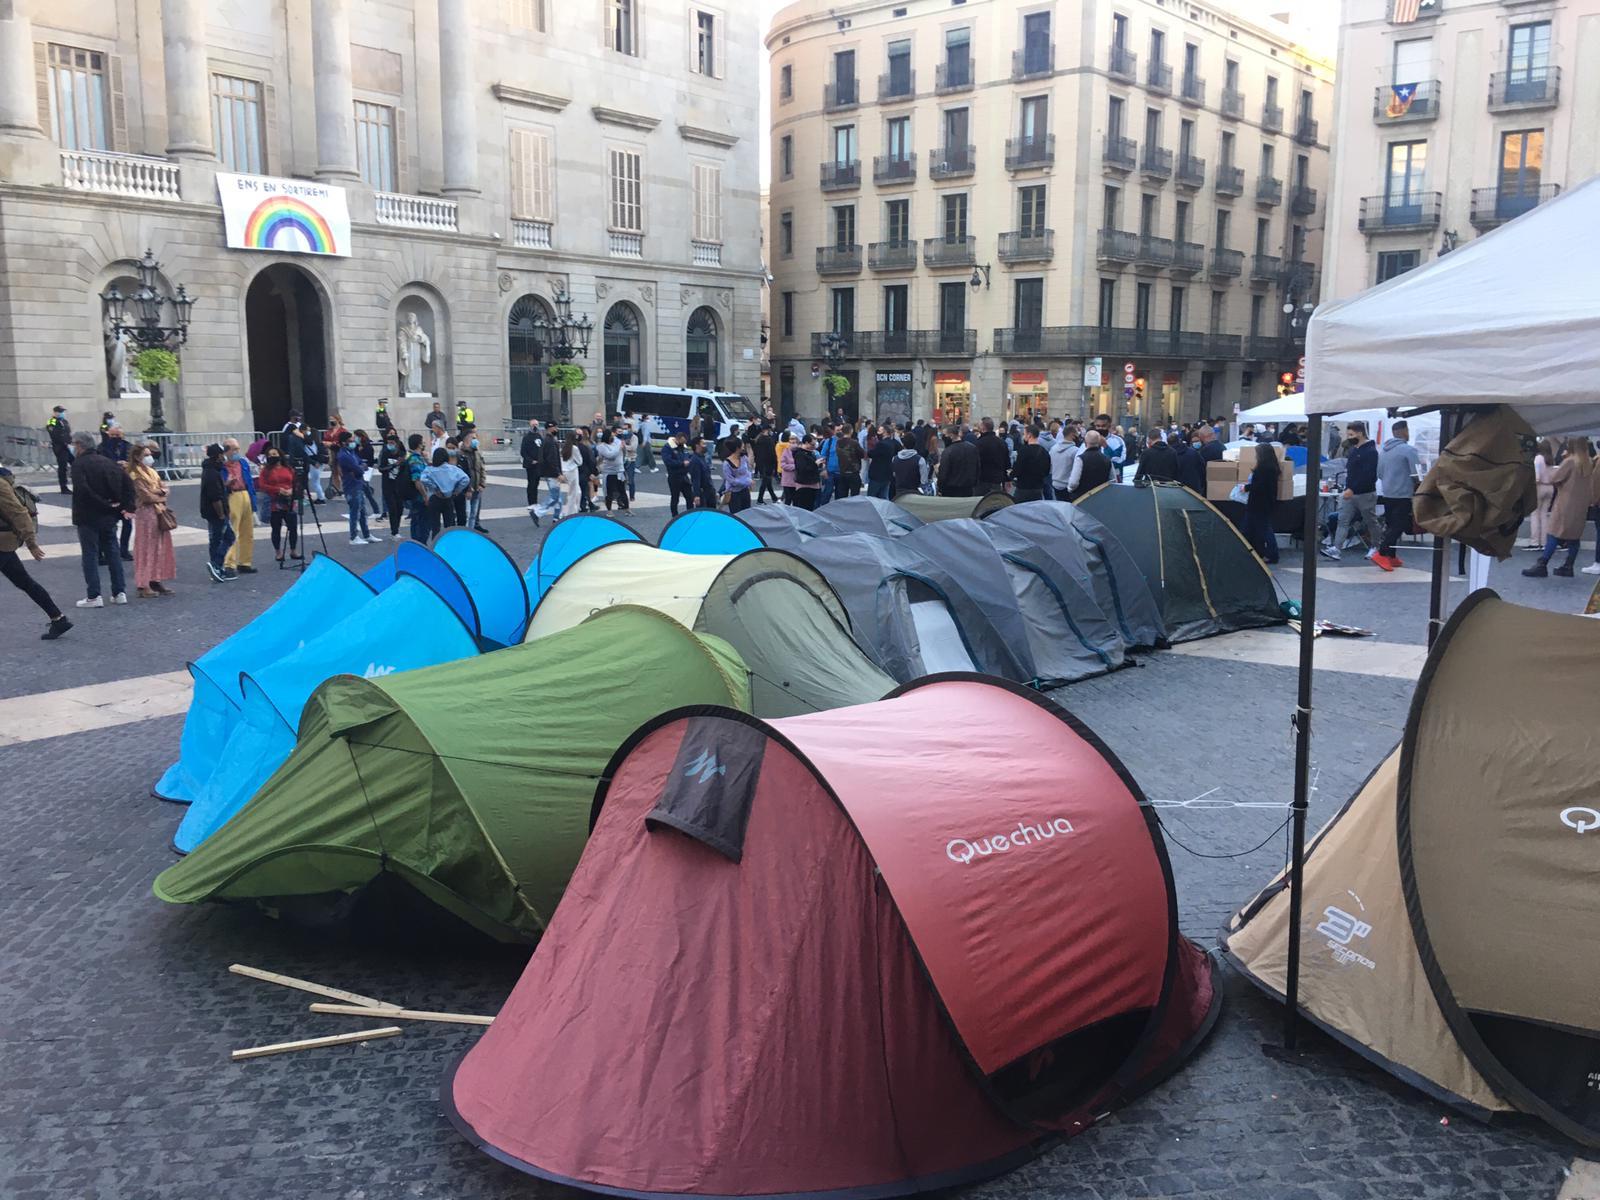 acampada oci nocturn